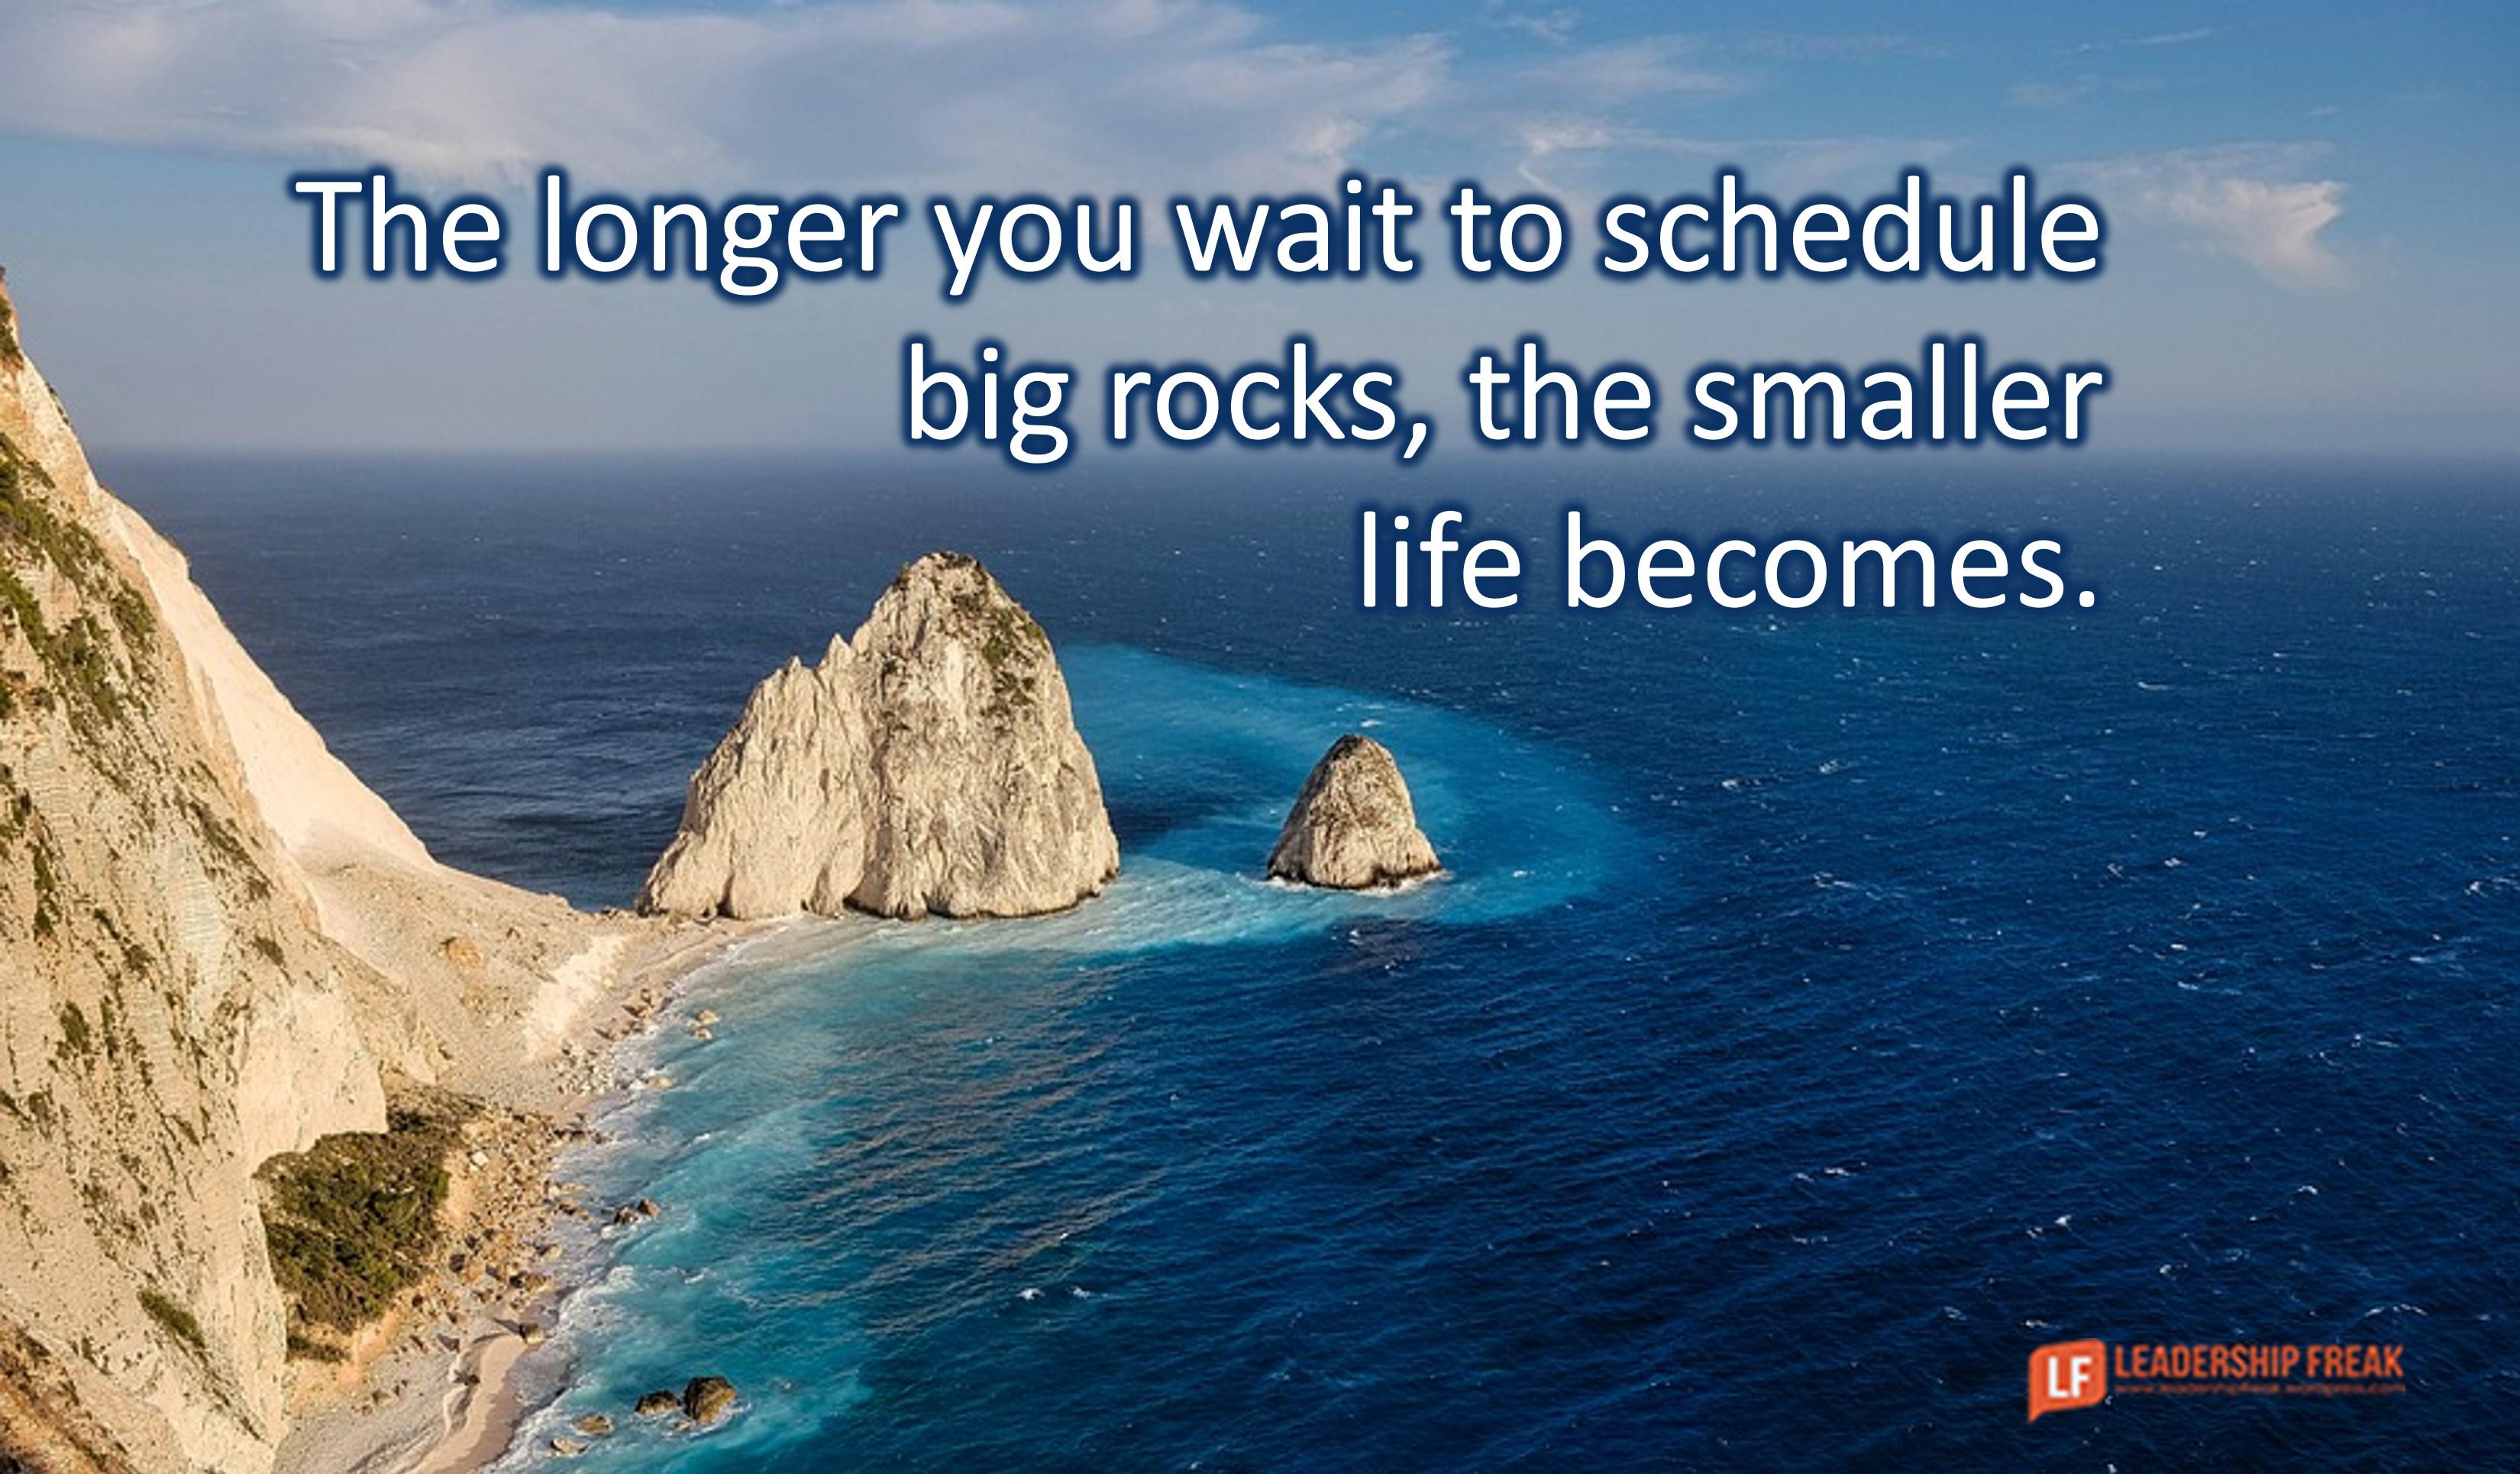 Put One Big Rock on Your Calendar